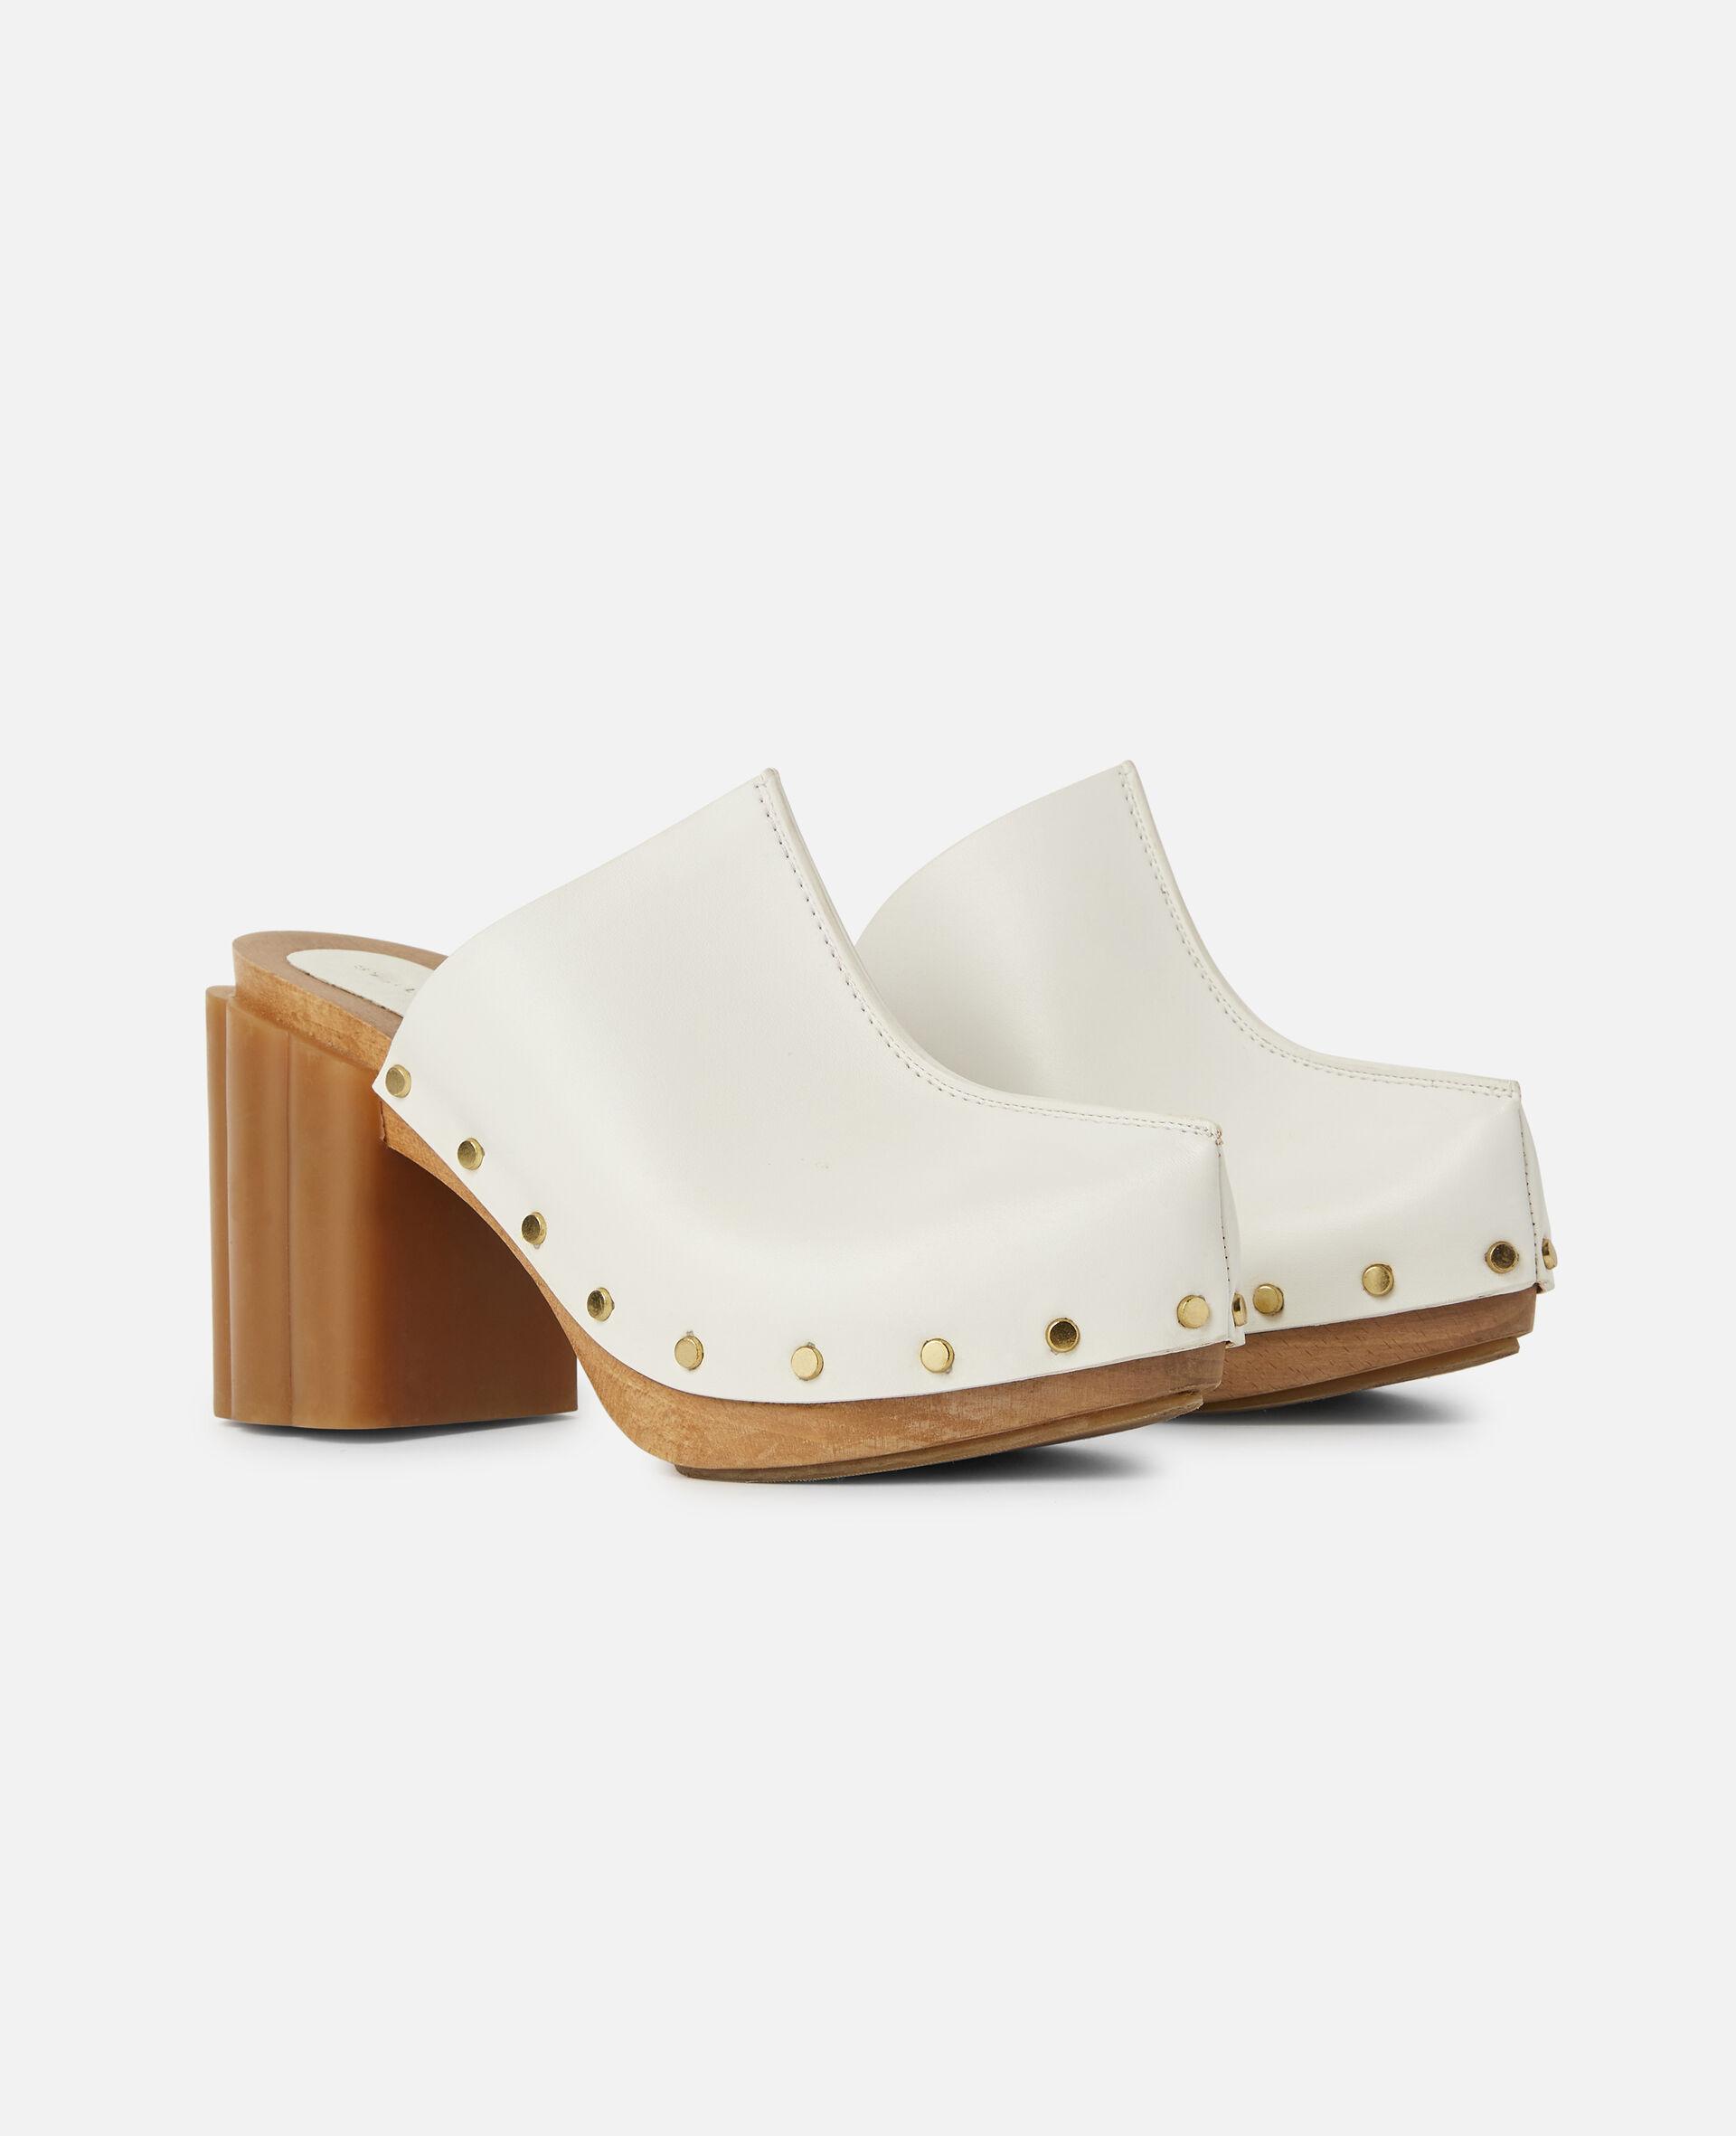 Sandales Daisy cloutées-Blanc-large image number 1